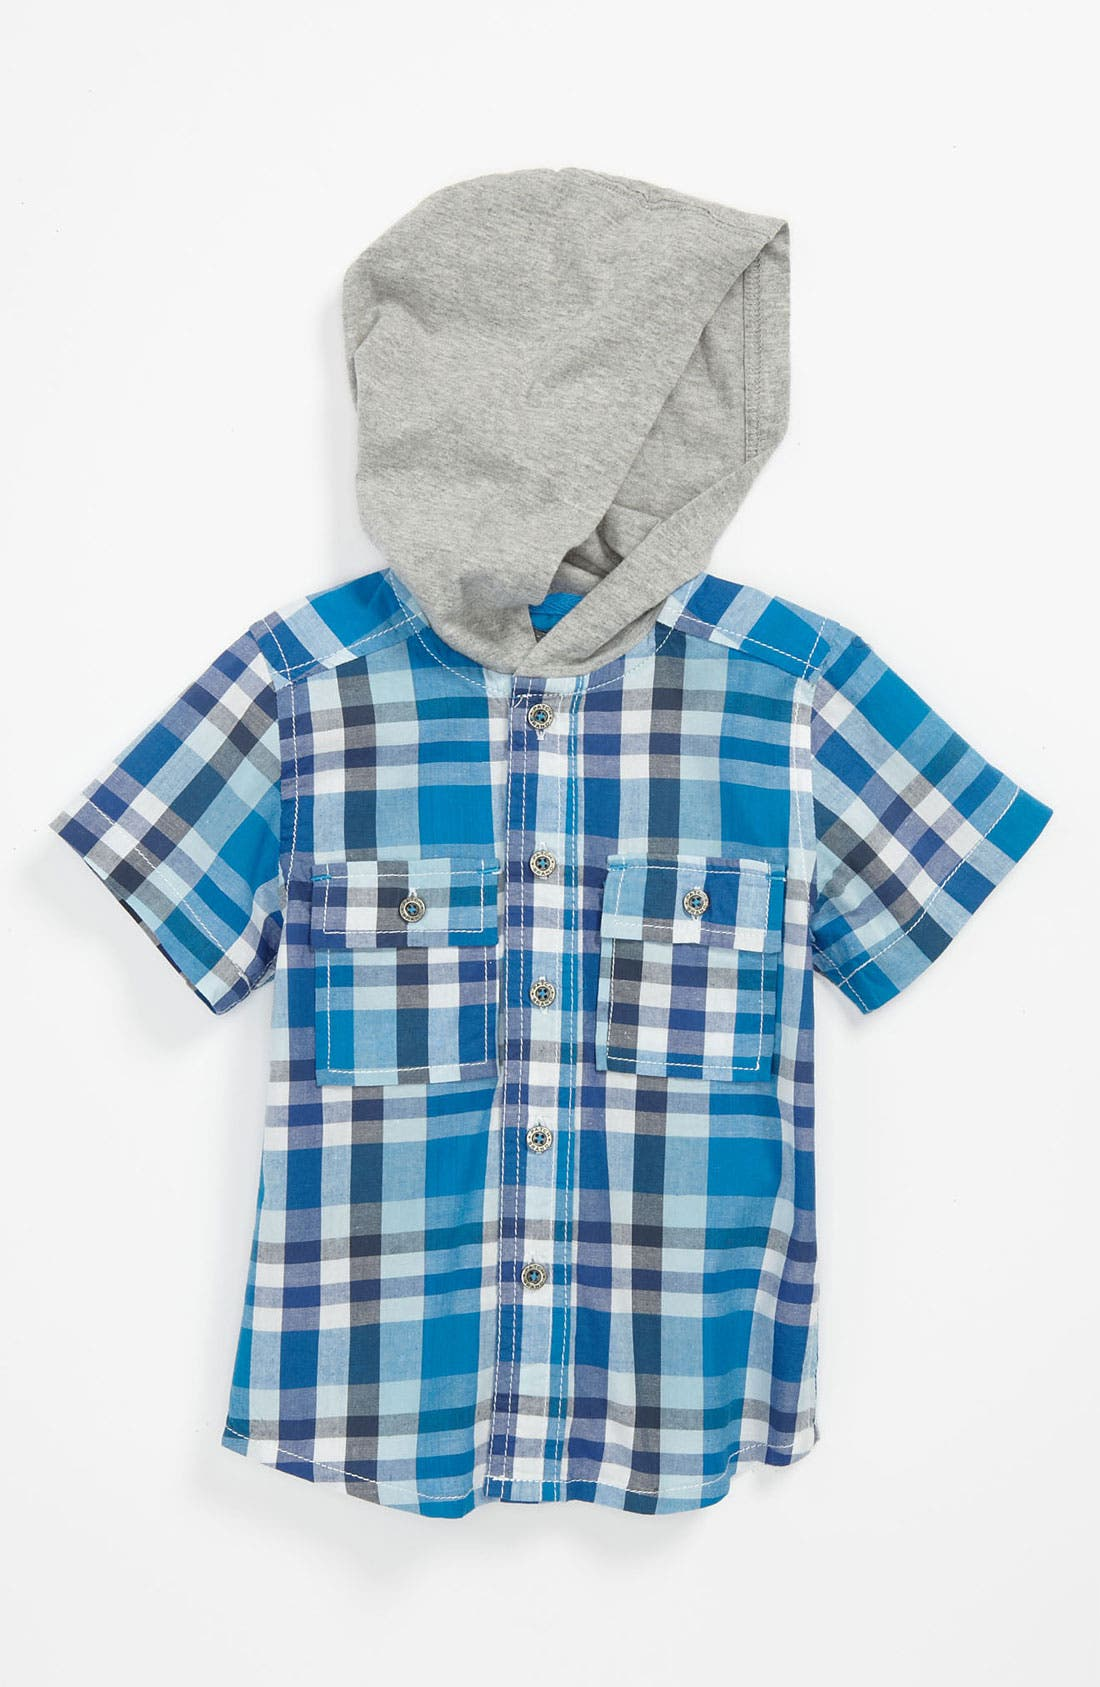 Alternate Image 1 Selected - Pumpkin Patch Hooded Shirt (Toddler)